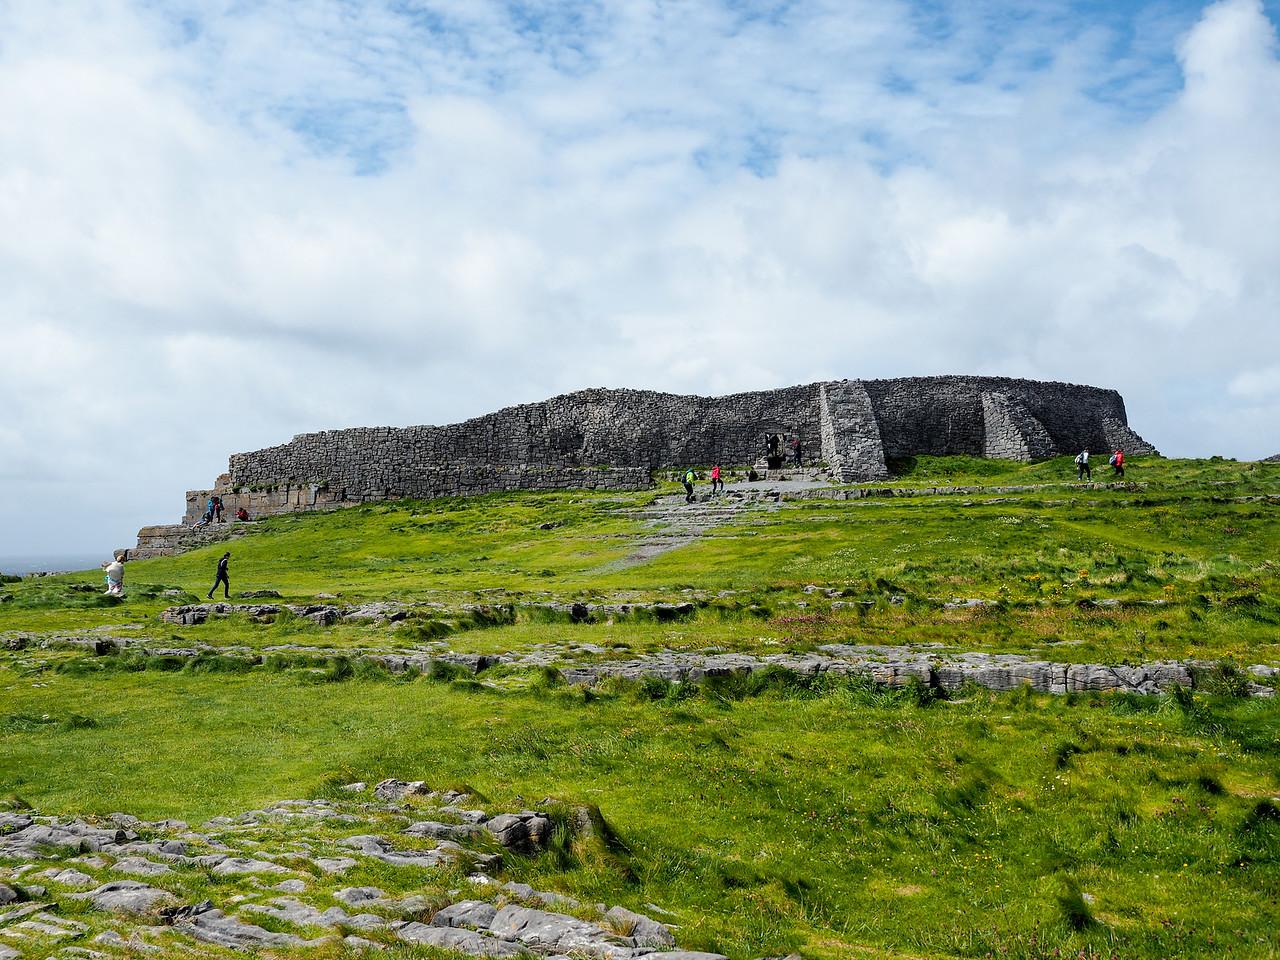 Dún Aonghasa in the Aran Islands